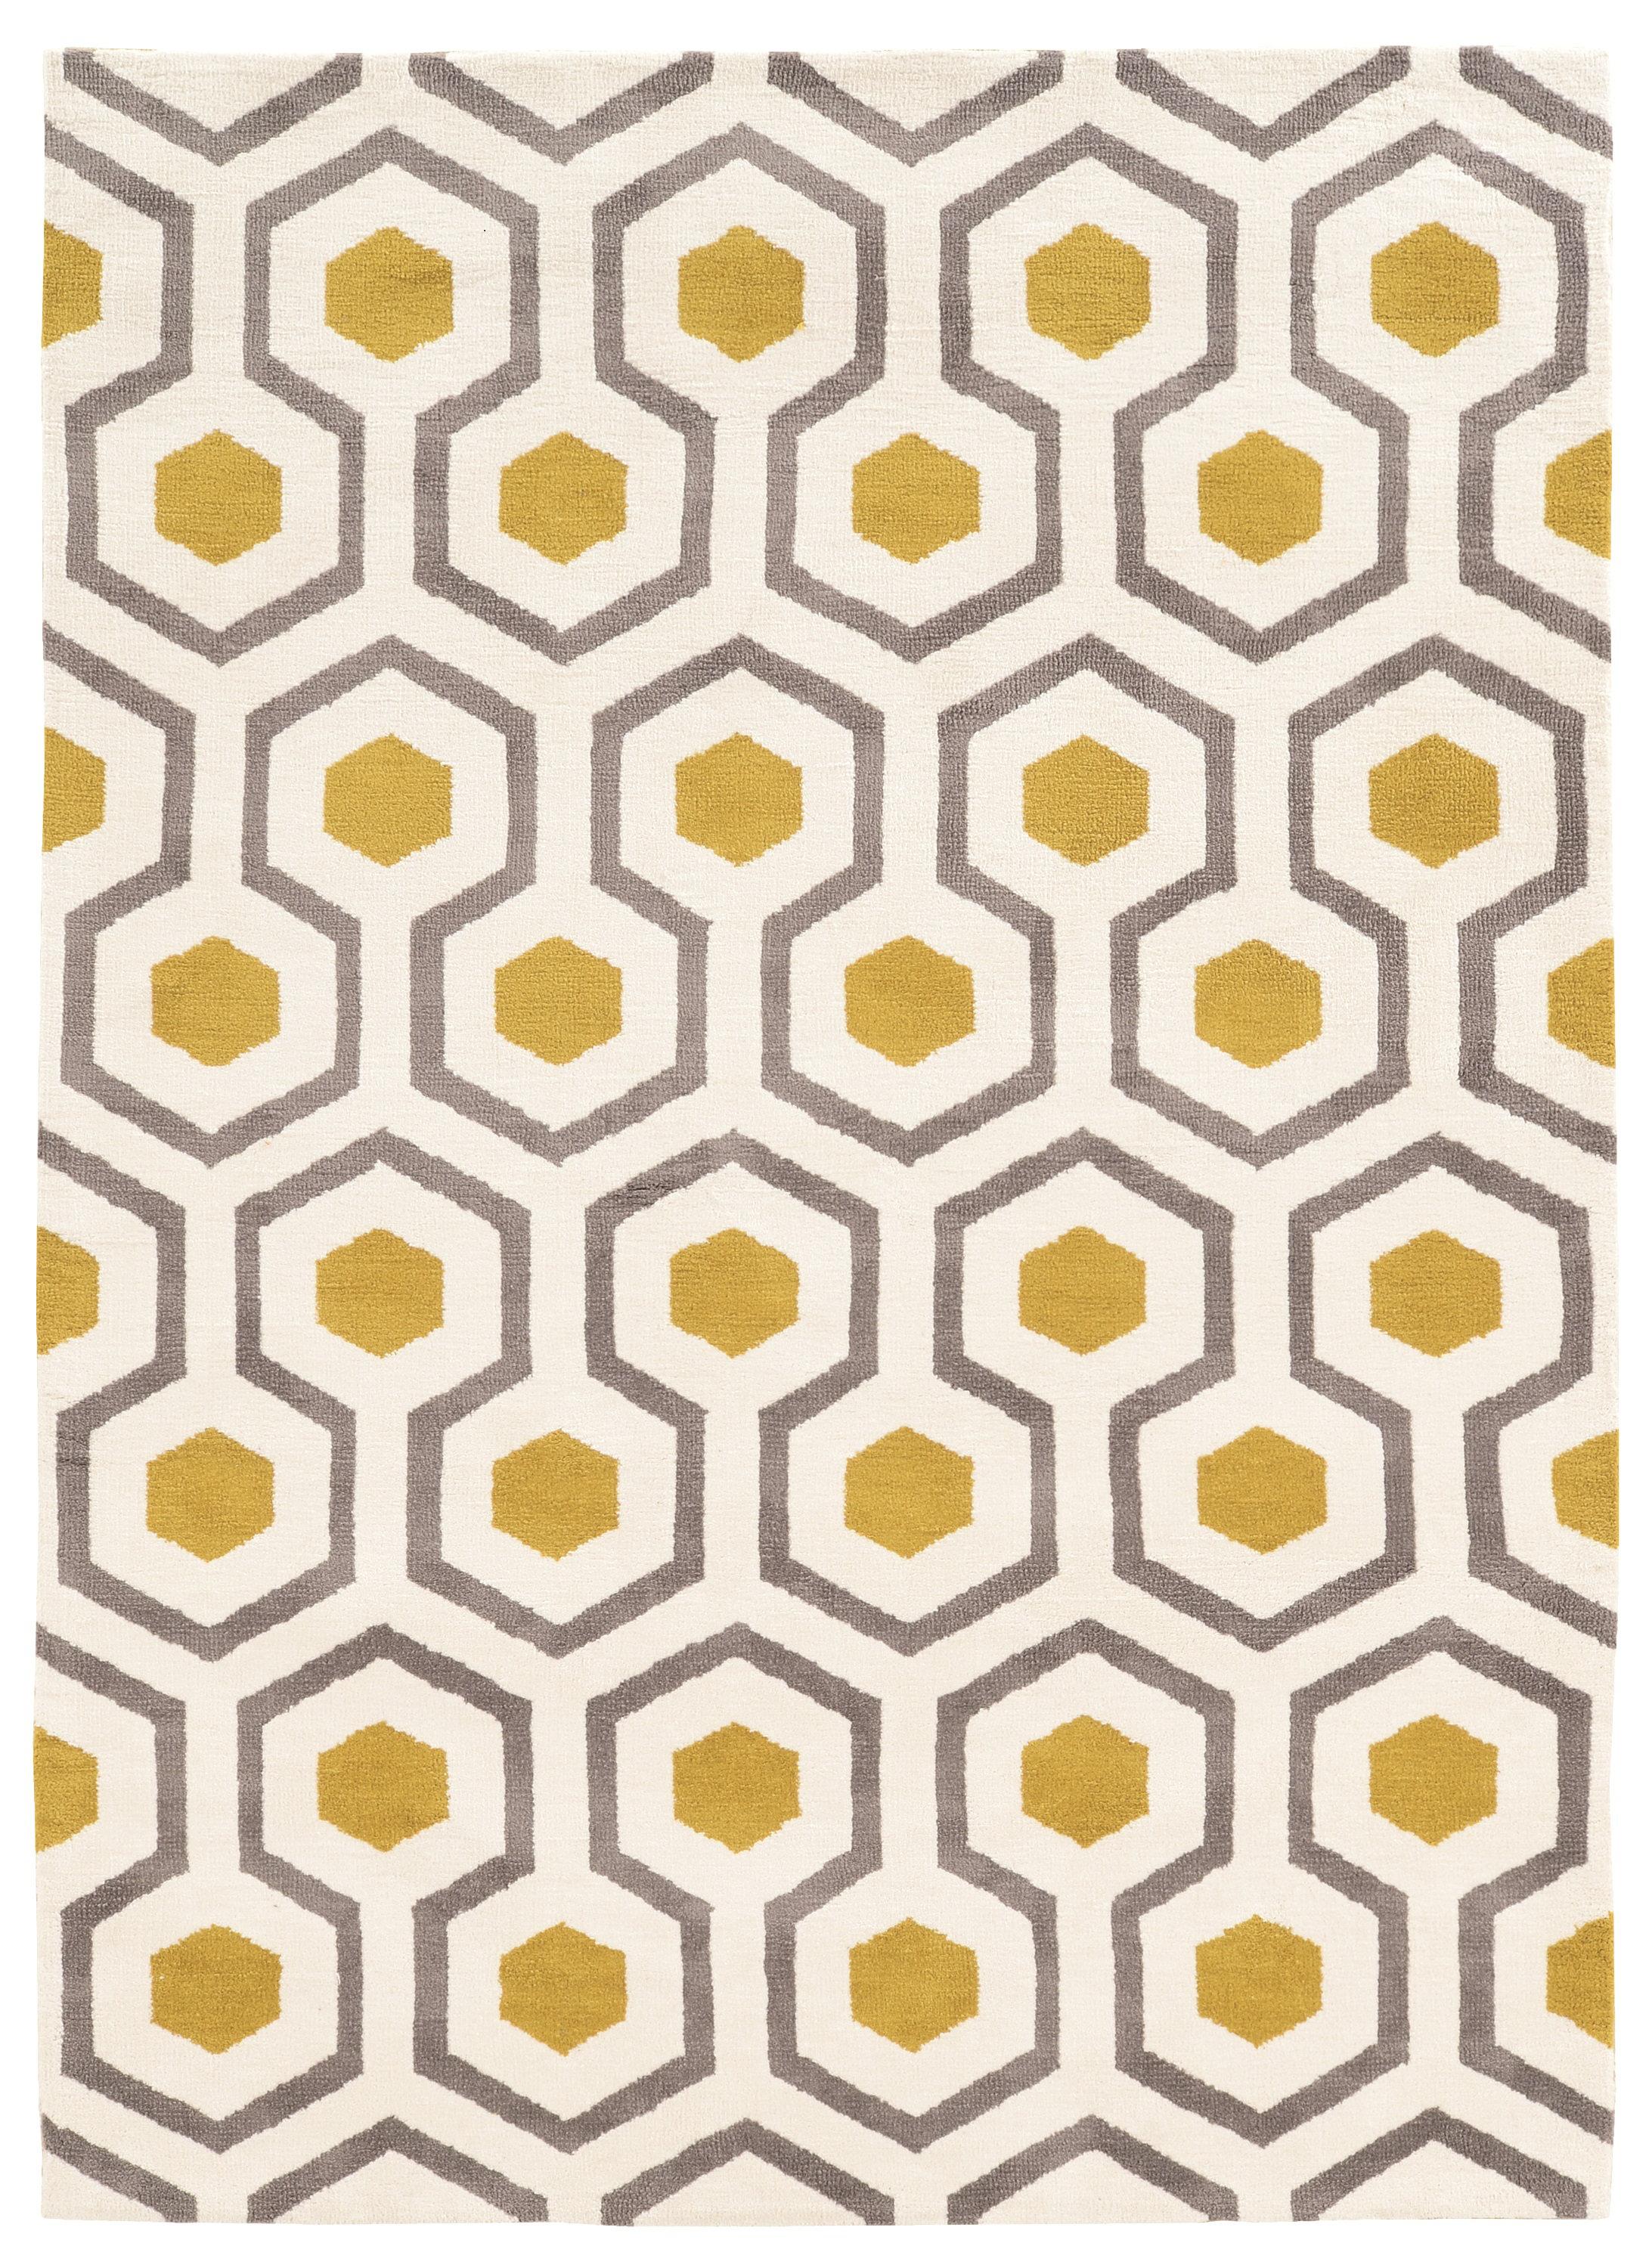 kids area art reviews co and yellowgrey uk rug pdp for yellow wayfair grey rugs